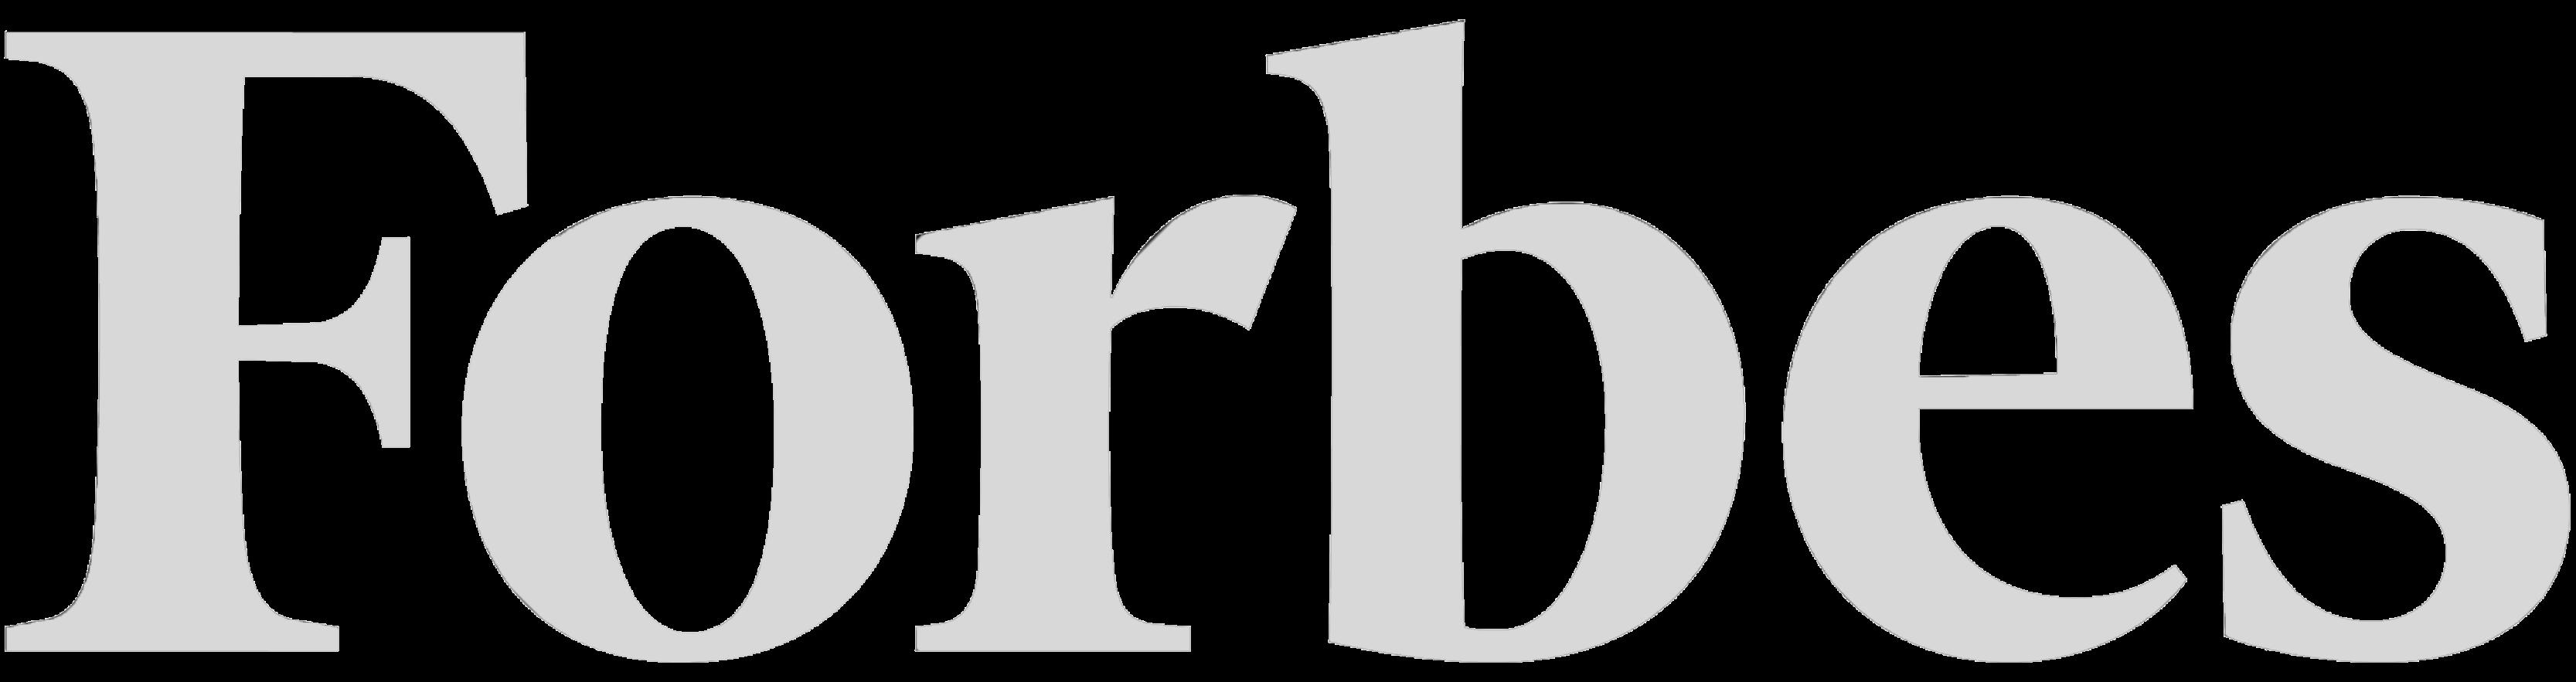 Forbes-Black-Logo-PNG-03003-2 copy.png